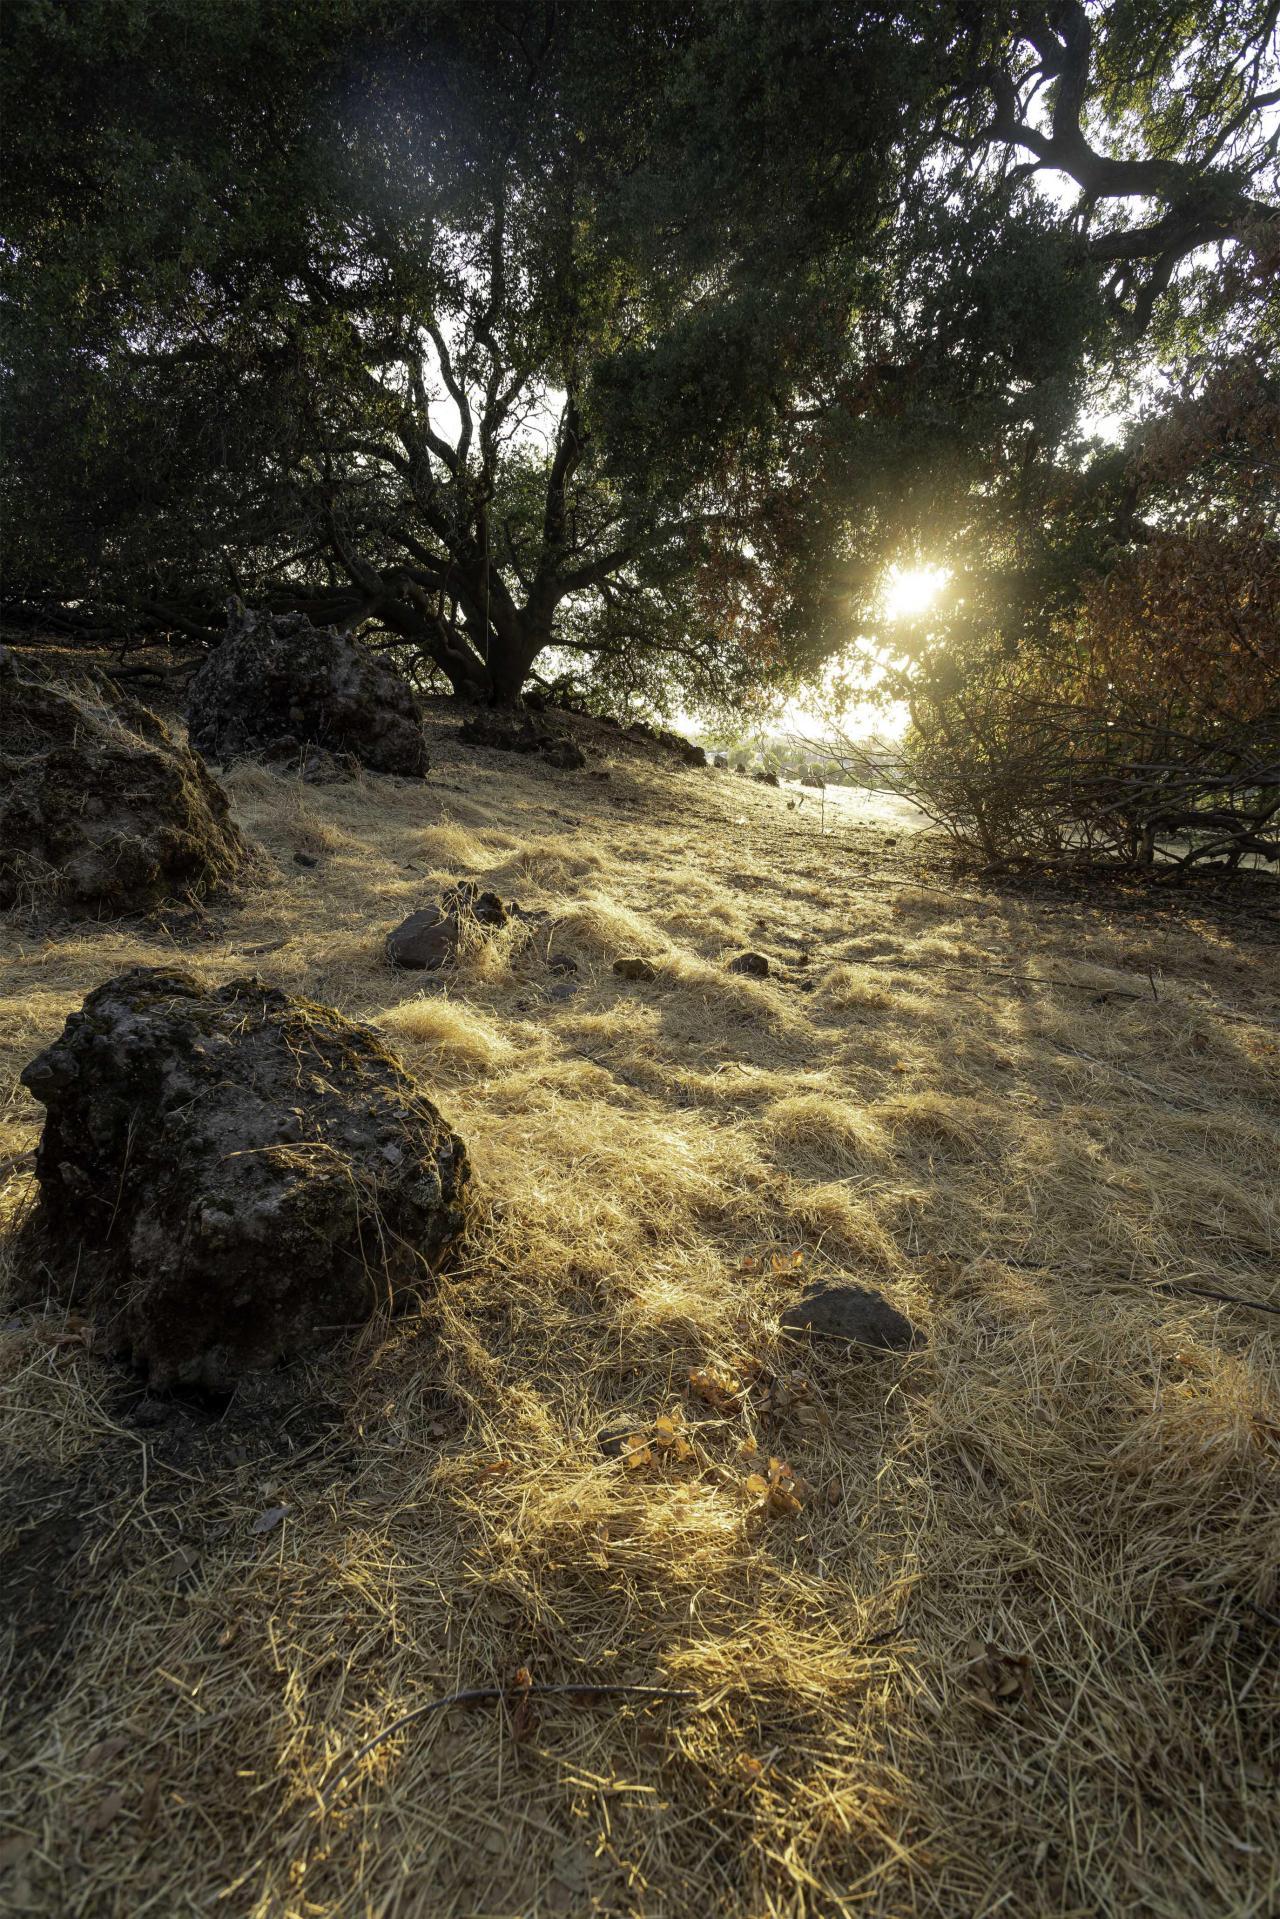 Lincoln, CA [2750x4123][OC] via /r/EarthPorn https://ift.tt/2XvGrqW #earth#landscape